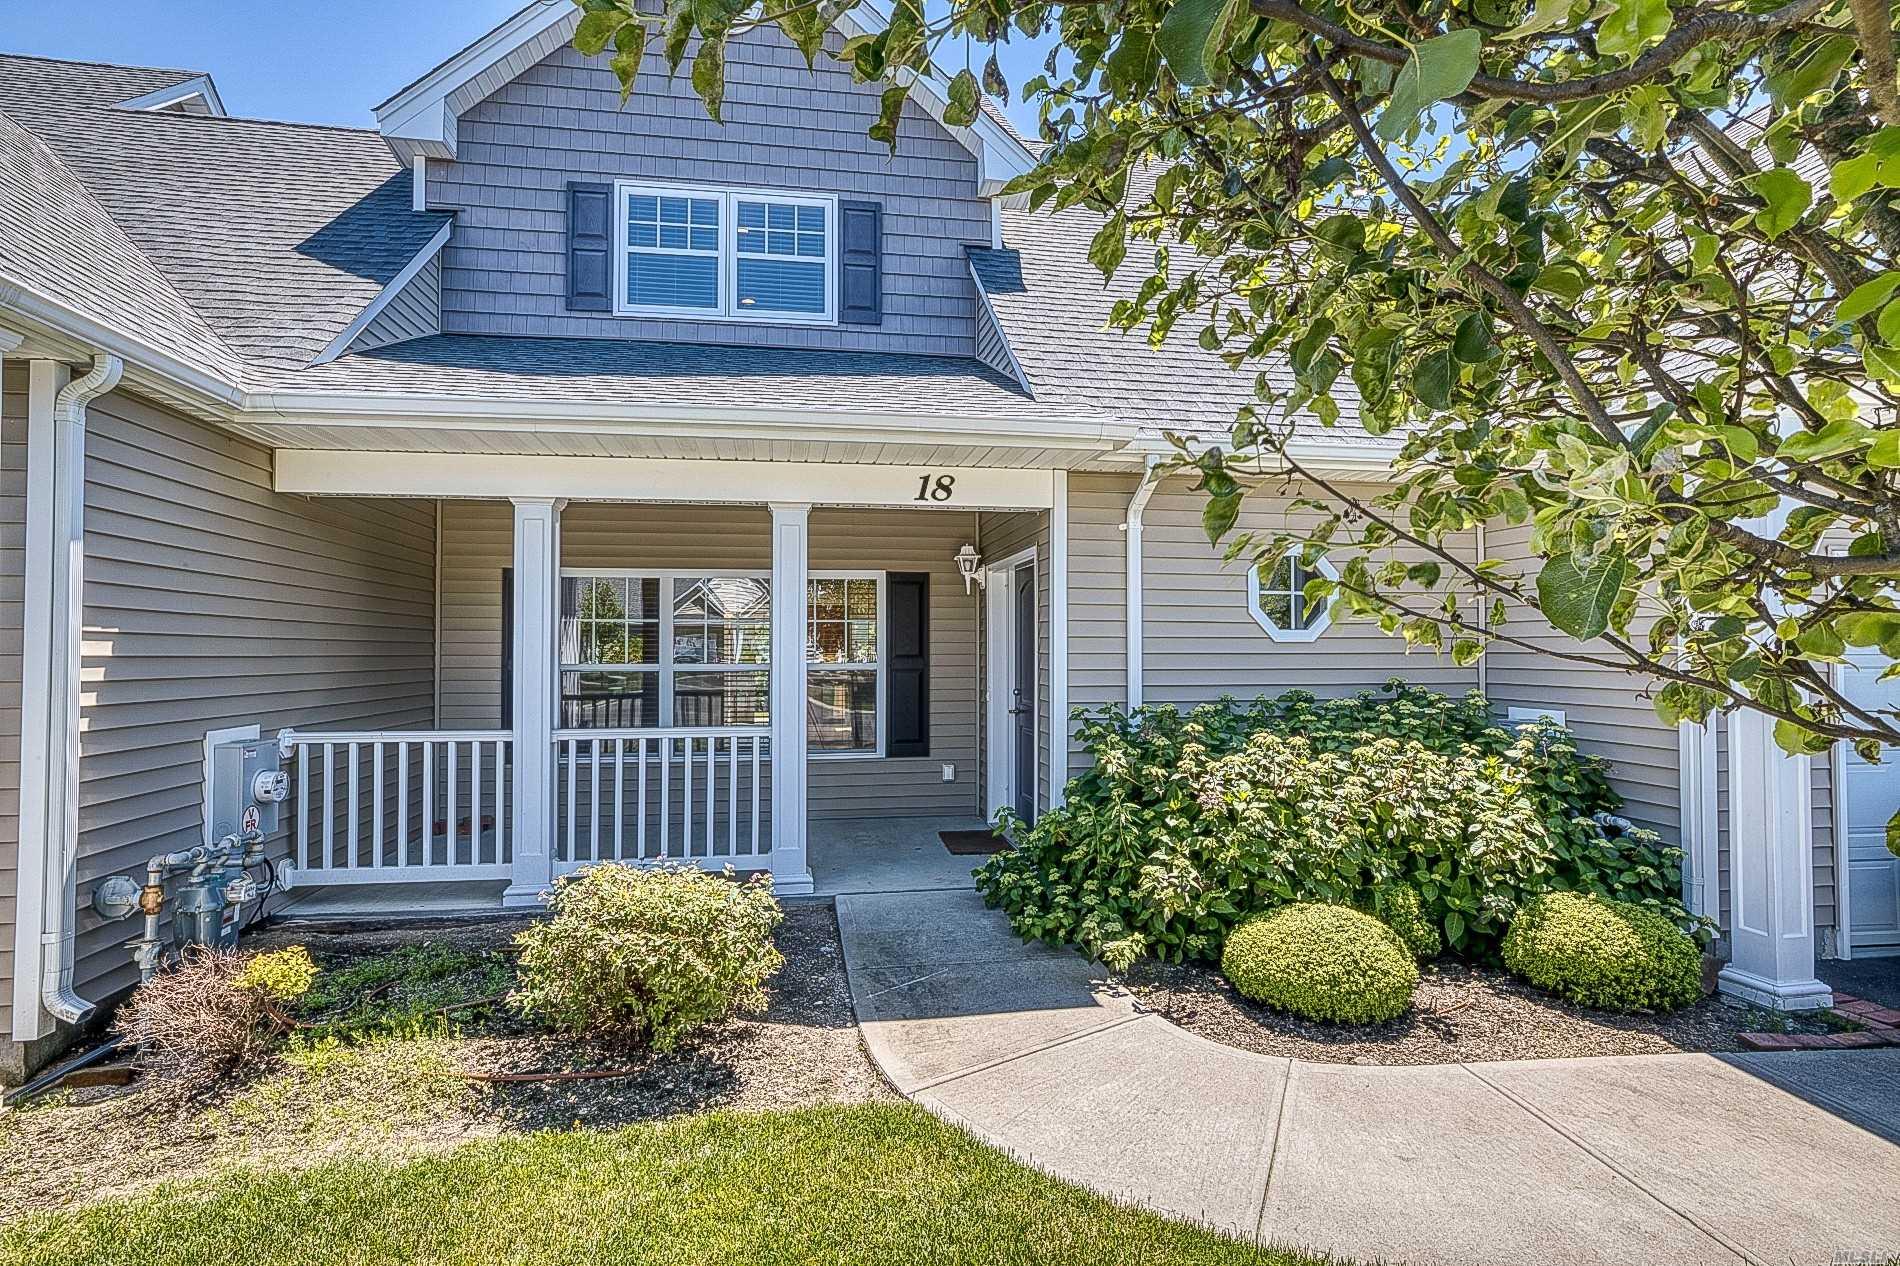 Property for sale at 18 Kennsington Court, Riverhead NY 11901, Riverhead,  New York 11901